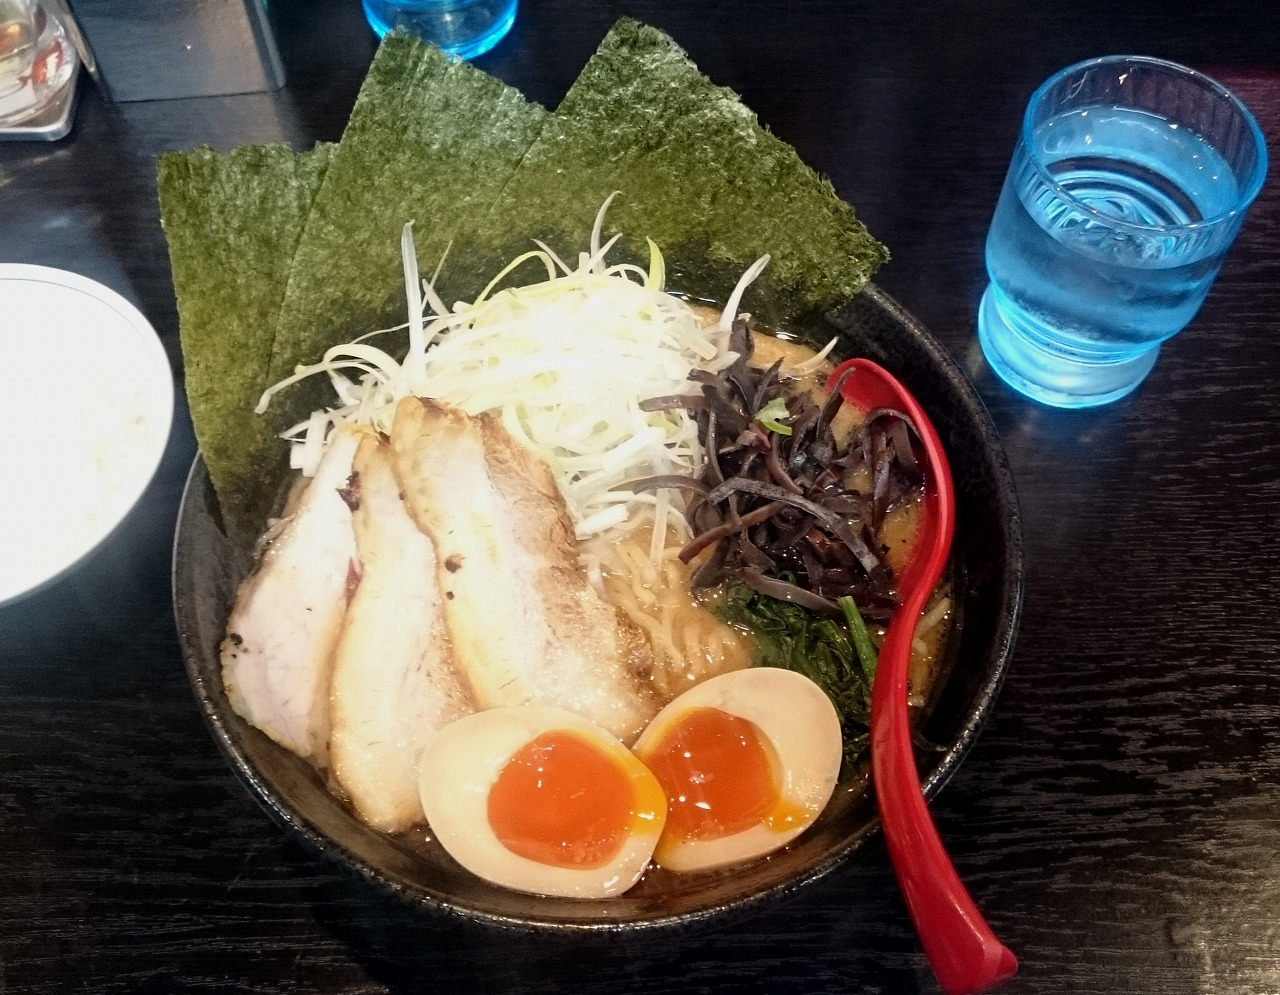 20170321-Dinner_Noodles-X01.jpg